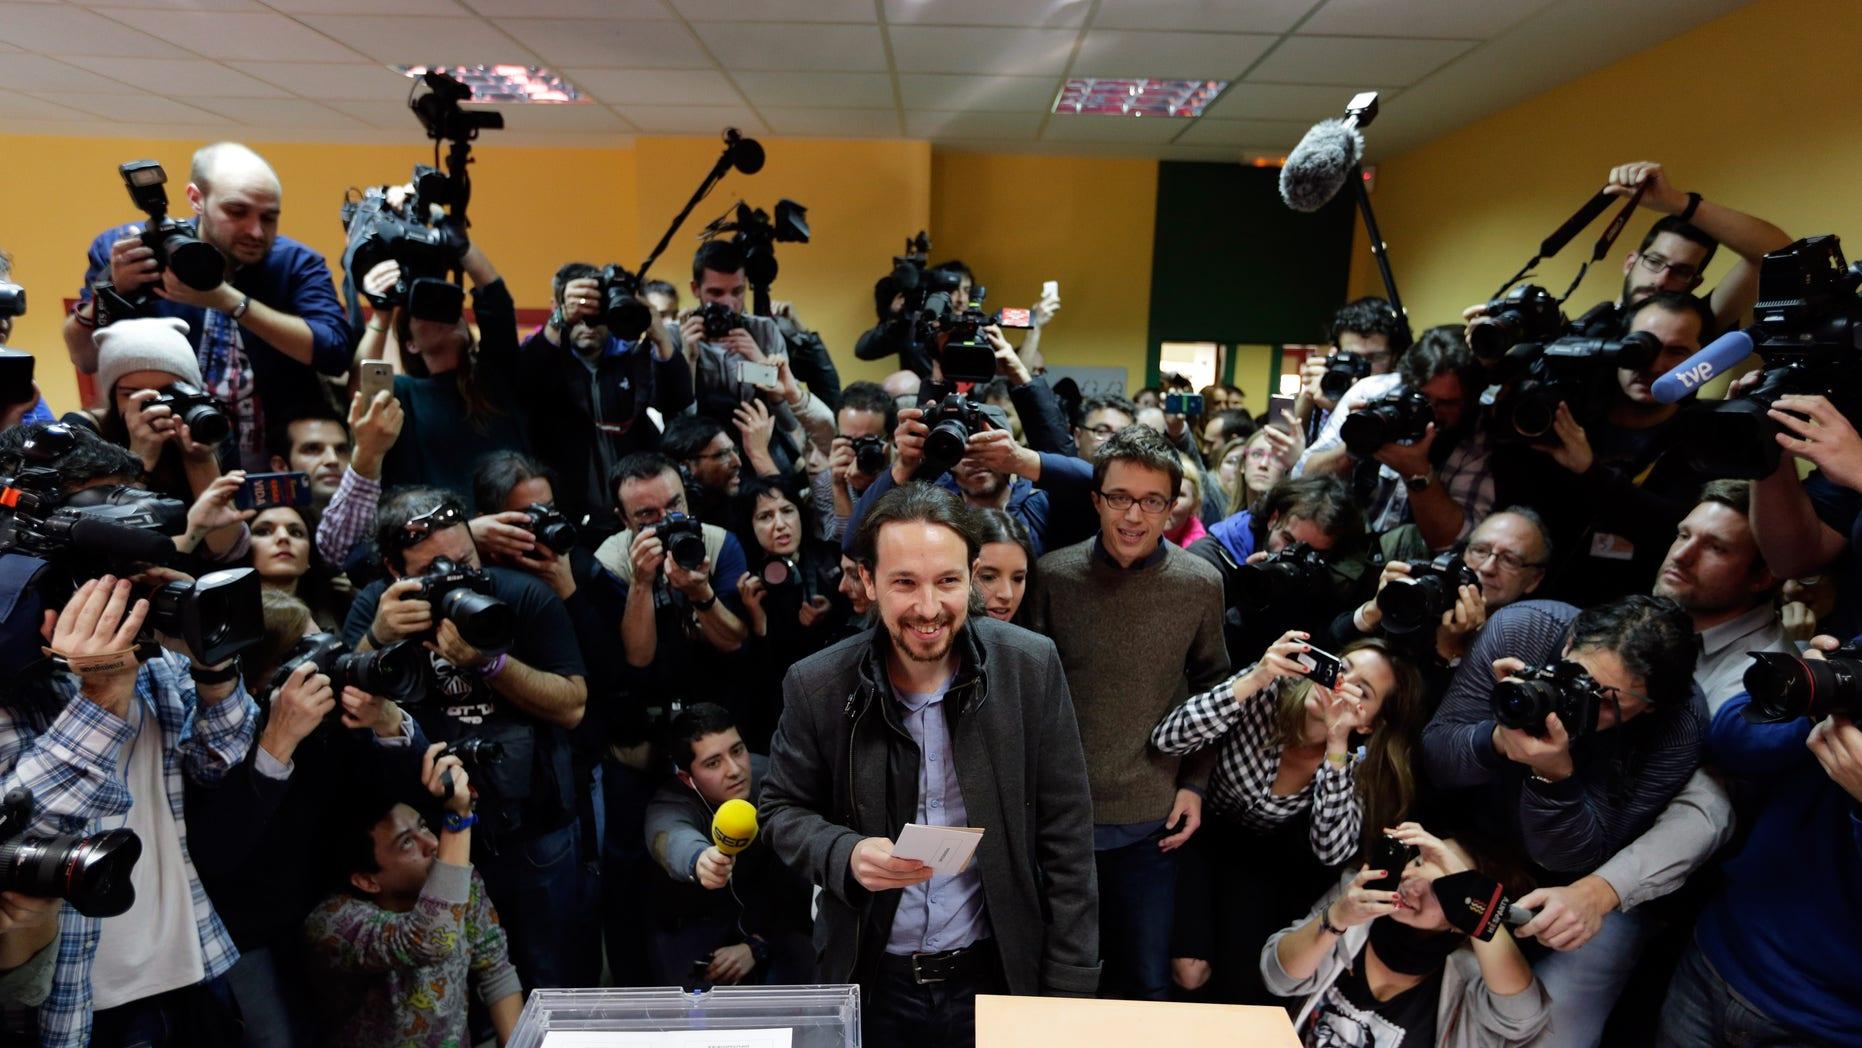 Pablo Iglesias, leader of Podemos party, casts his vote in Madrid, Sunday, Dec. 20, 2015.